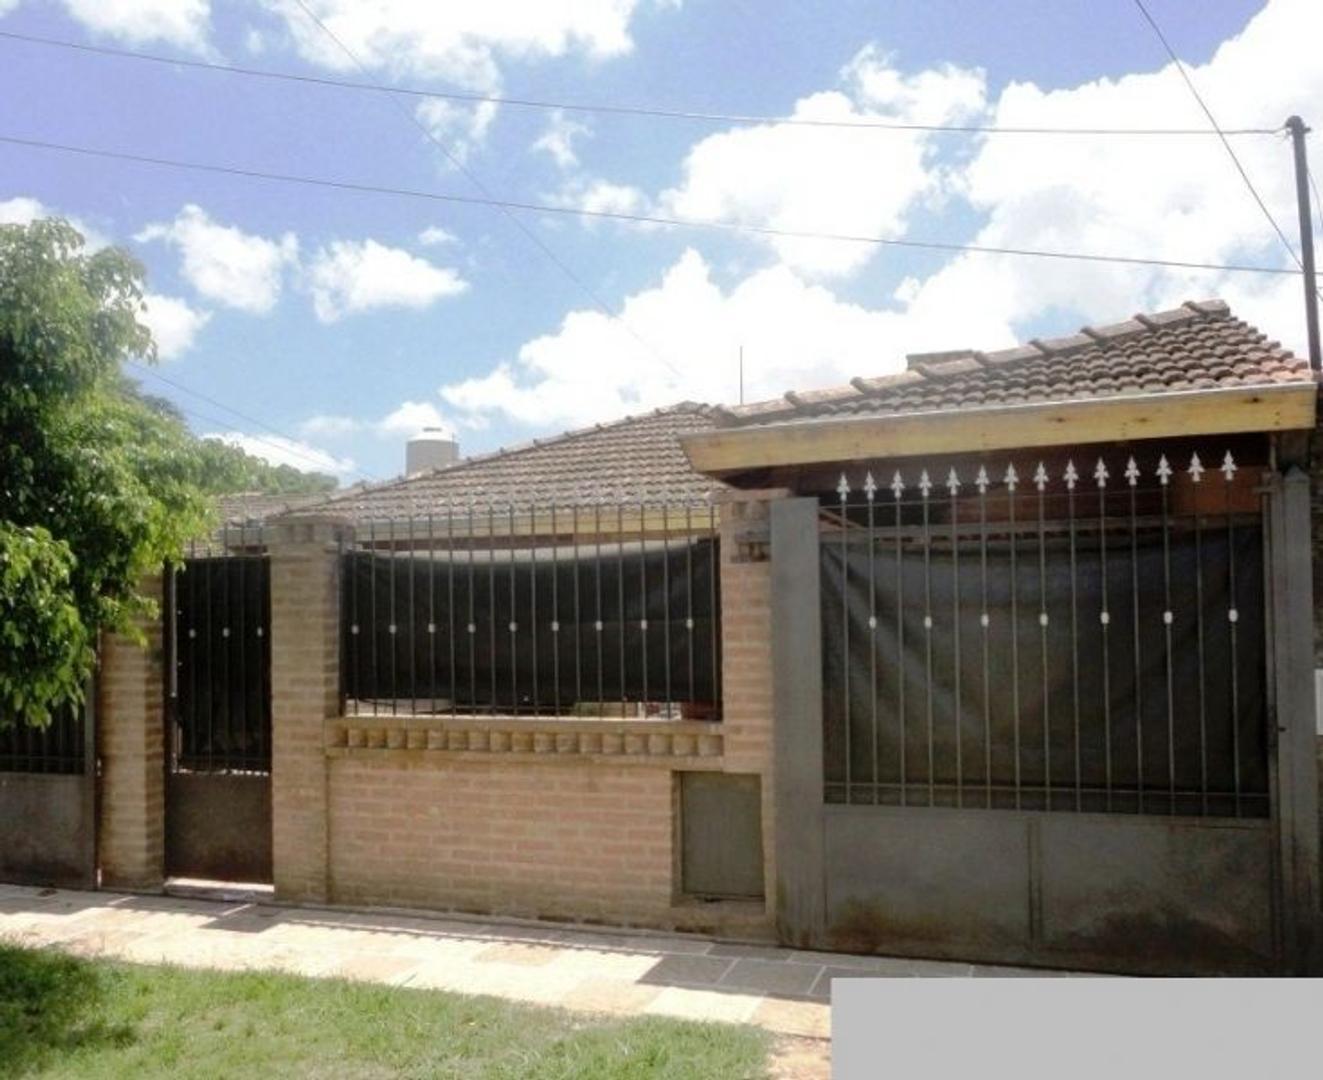 XINTEL(FNE-FNM-1233) Casa - Venta - Argentina, San Miguel - Rosetti 1980